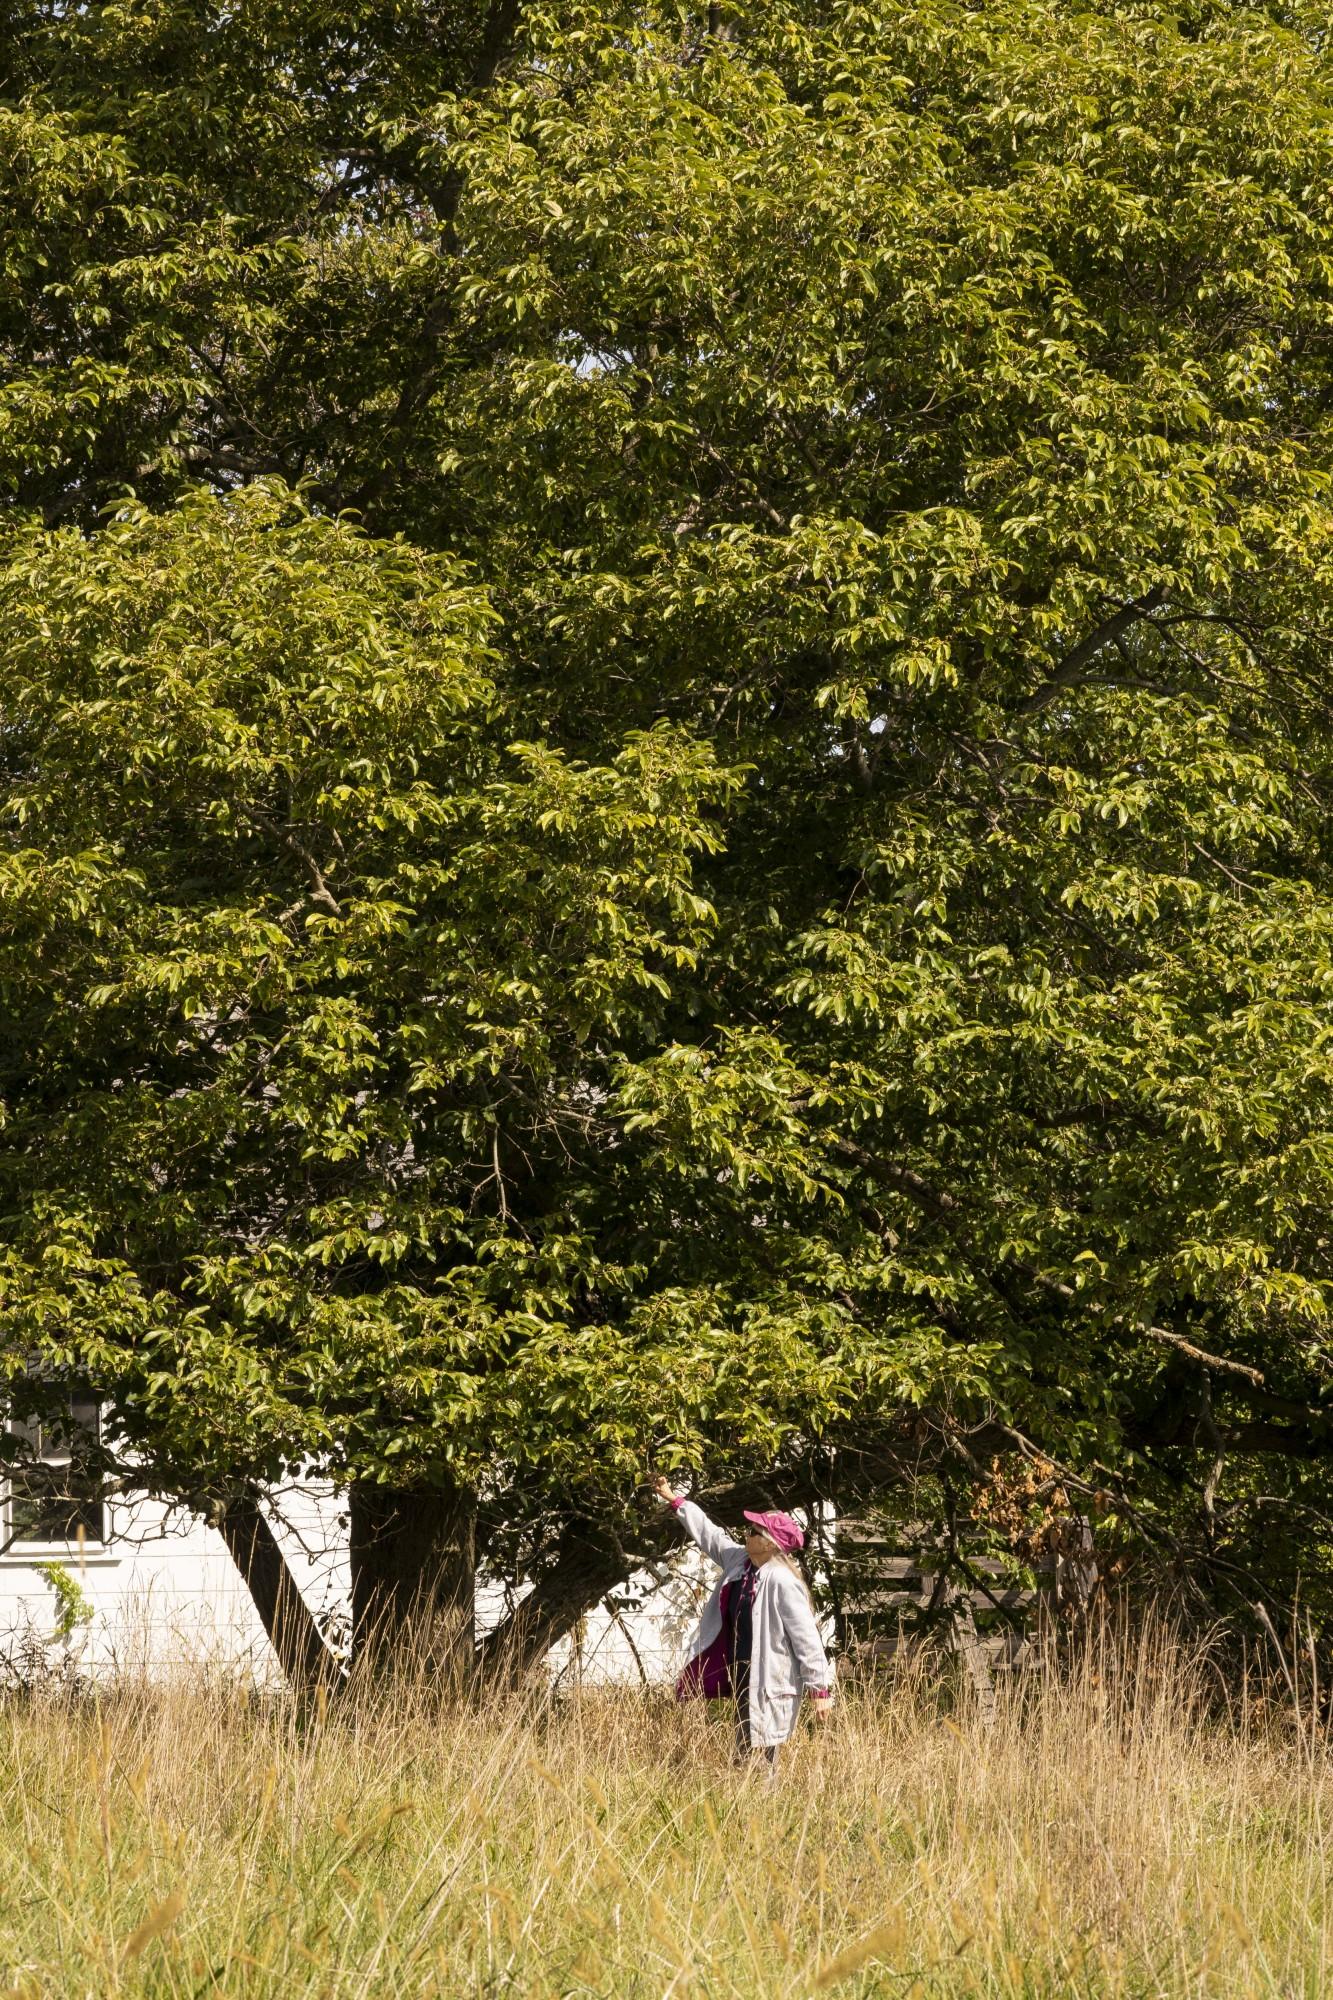 MaryLu Lageman, 80, of Loveland, Ohio, with her Chinese Chestnut Tree on Tuesday, Sept. 21, 2020.